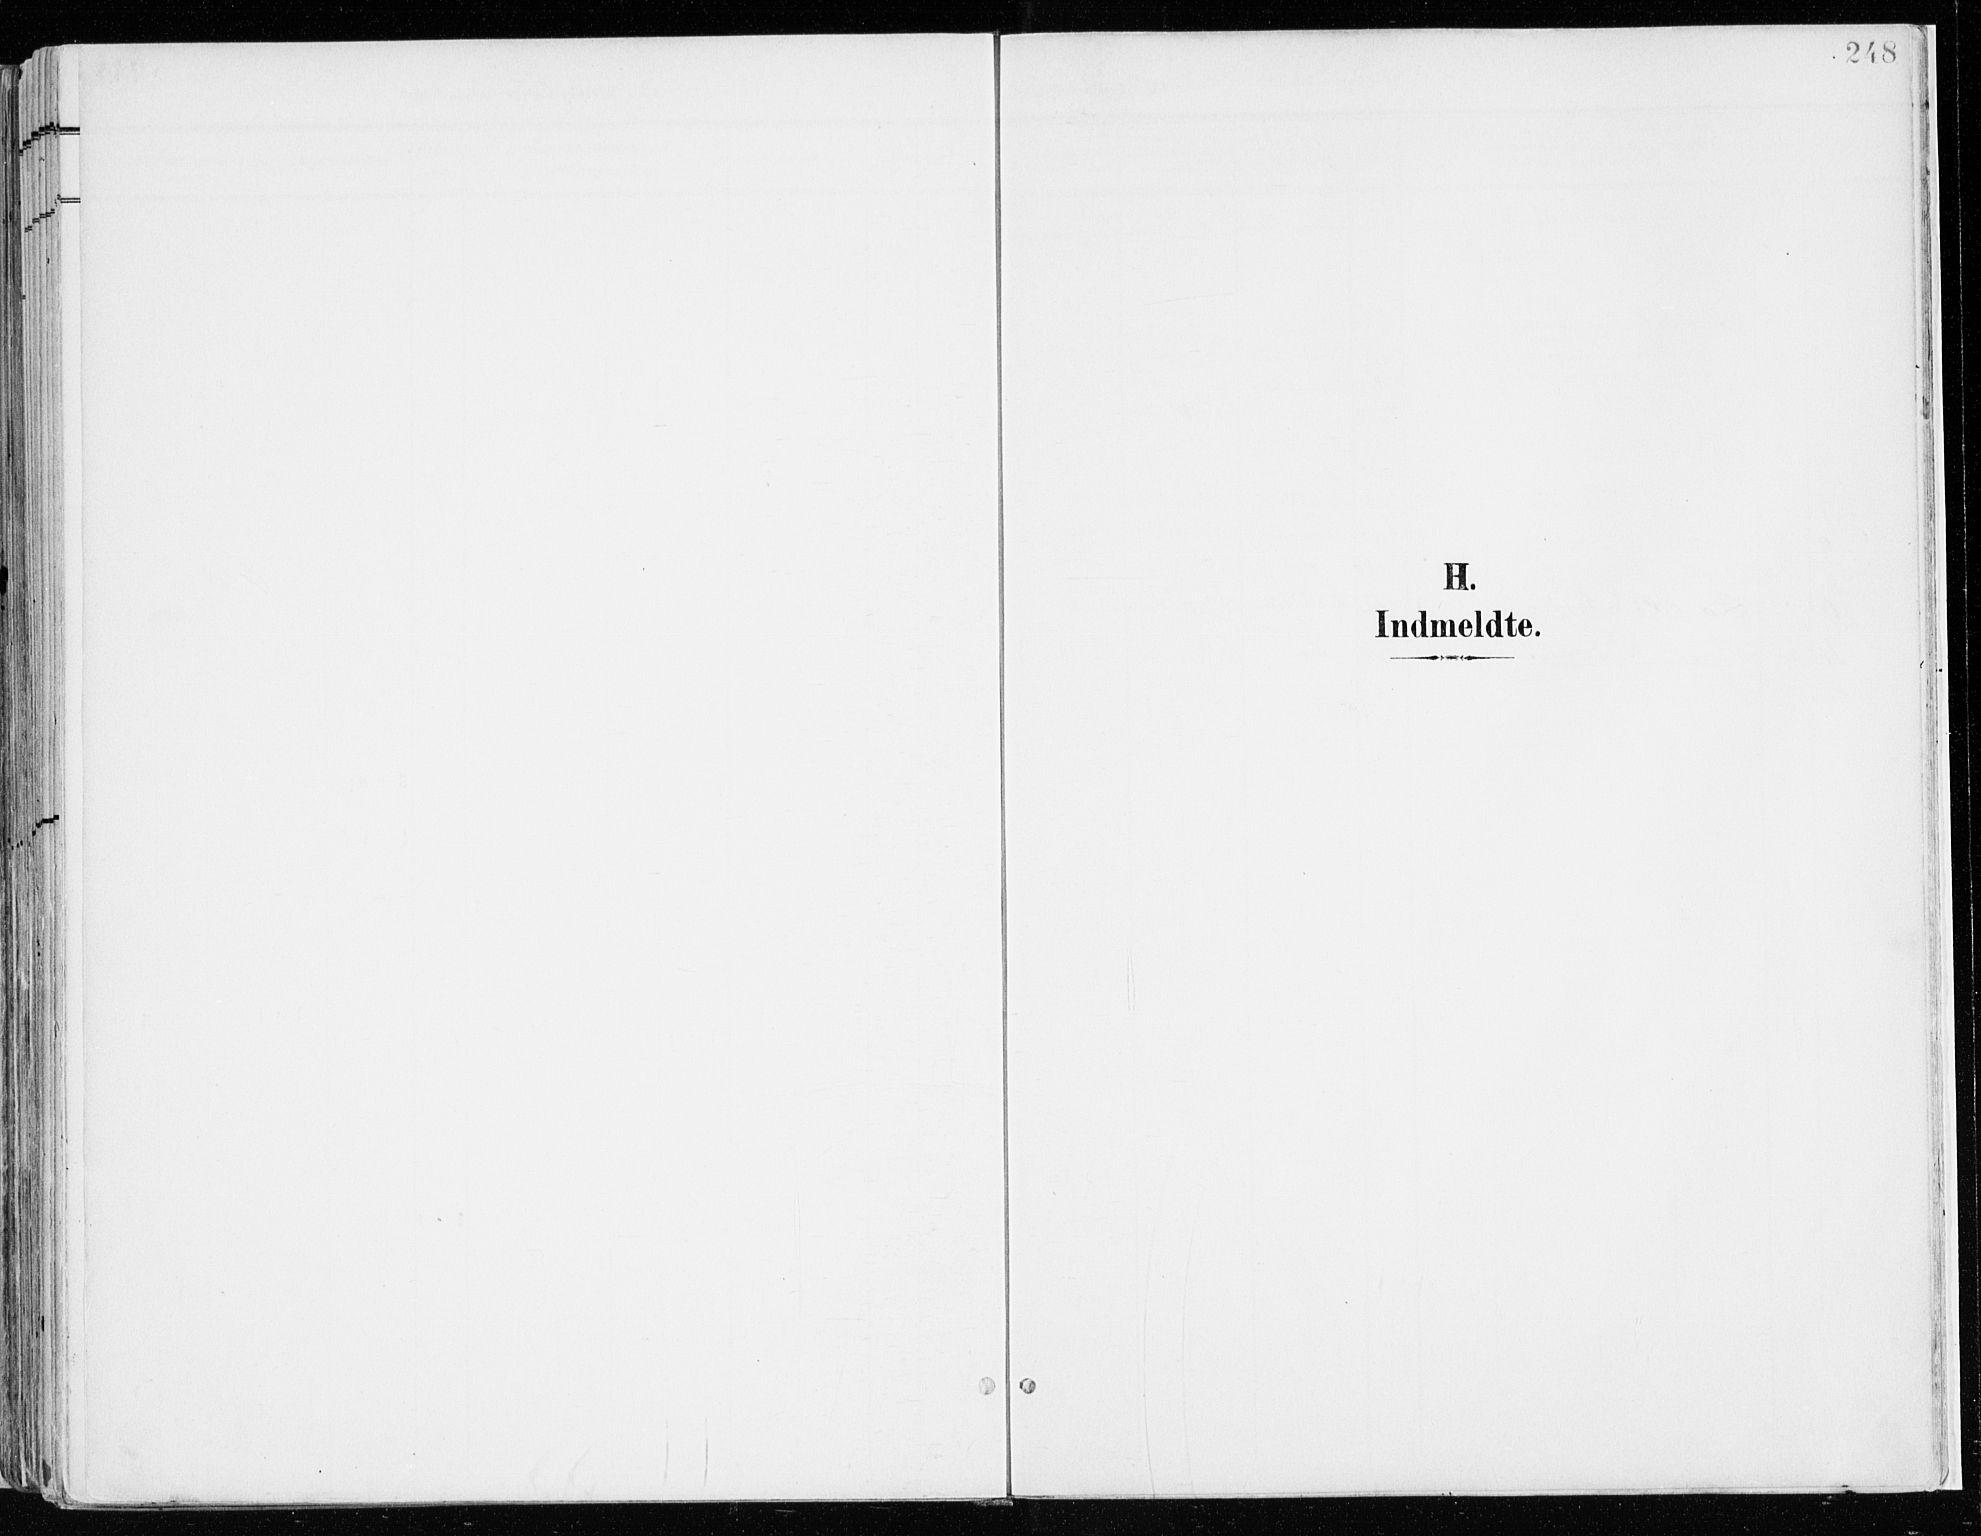 SAH, Nord-Odal prestekontor, Ministerialbok nr. 9, 1902-1926, s. 248